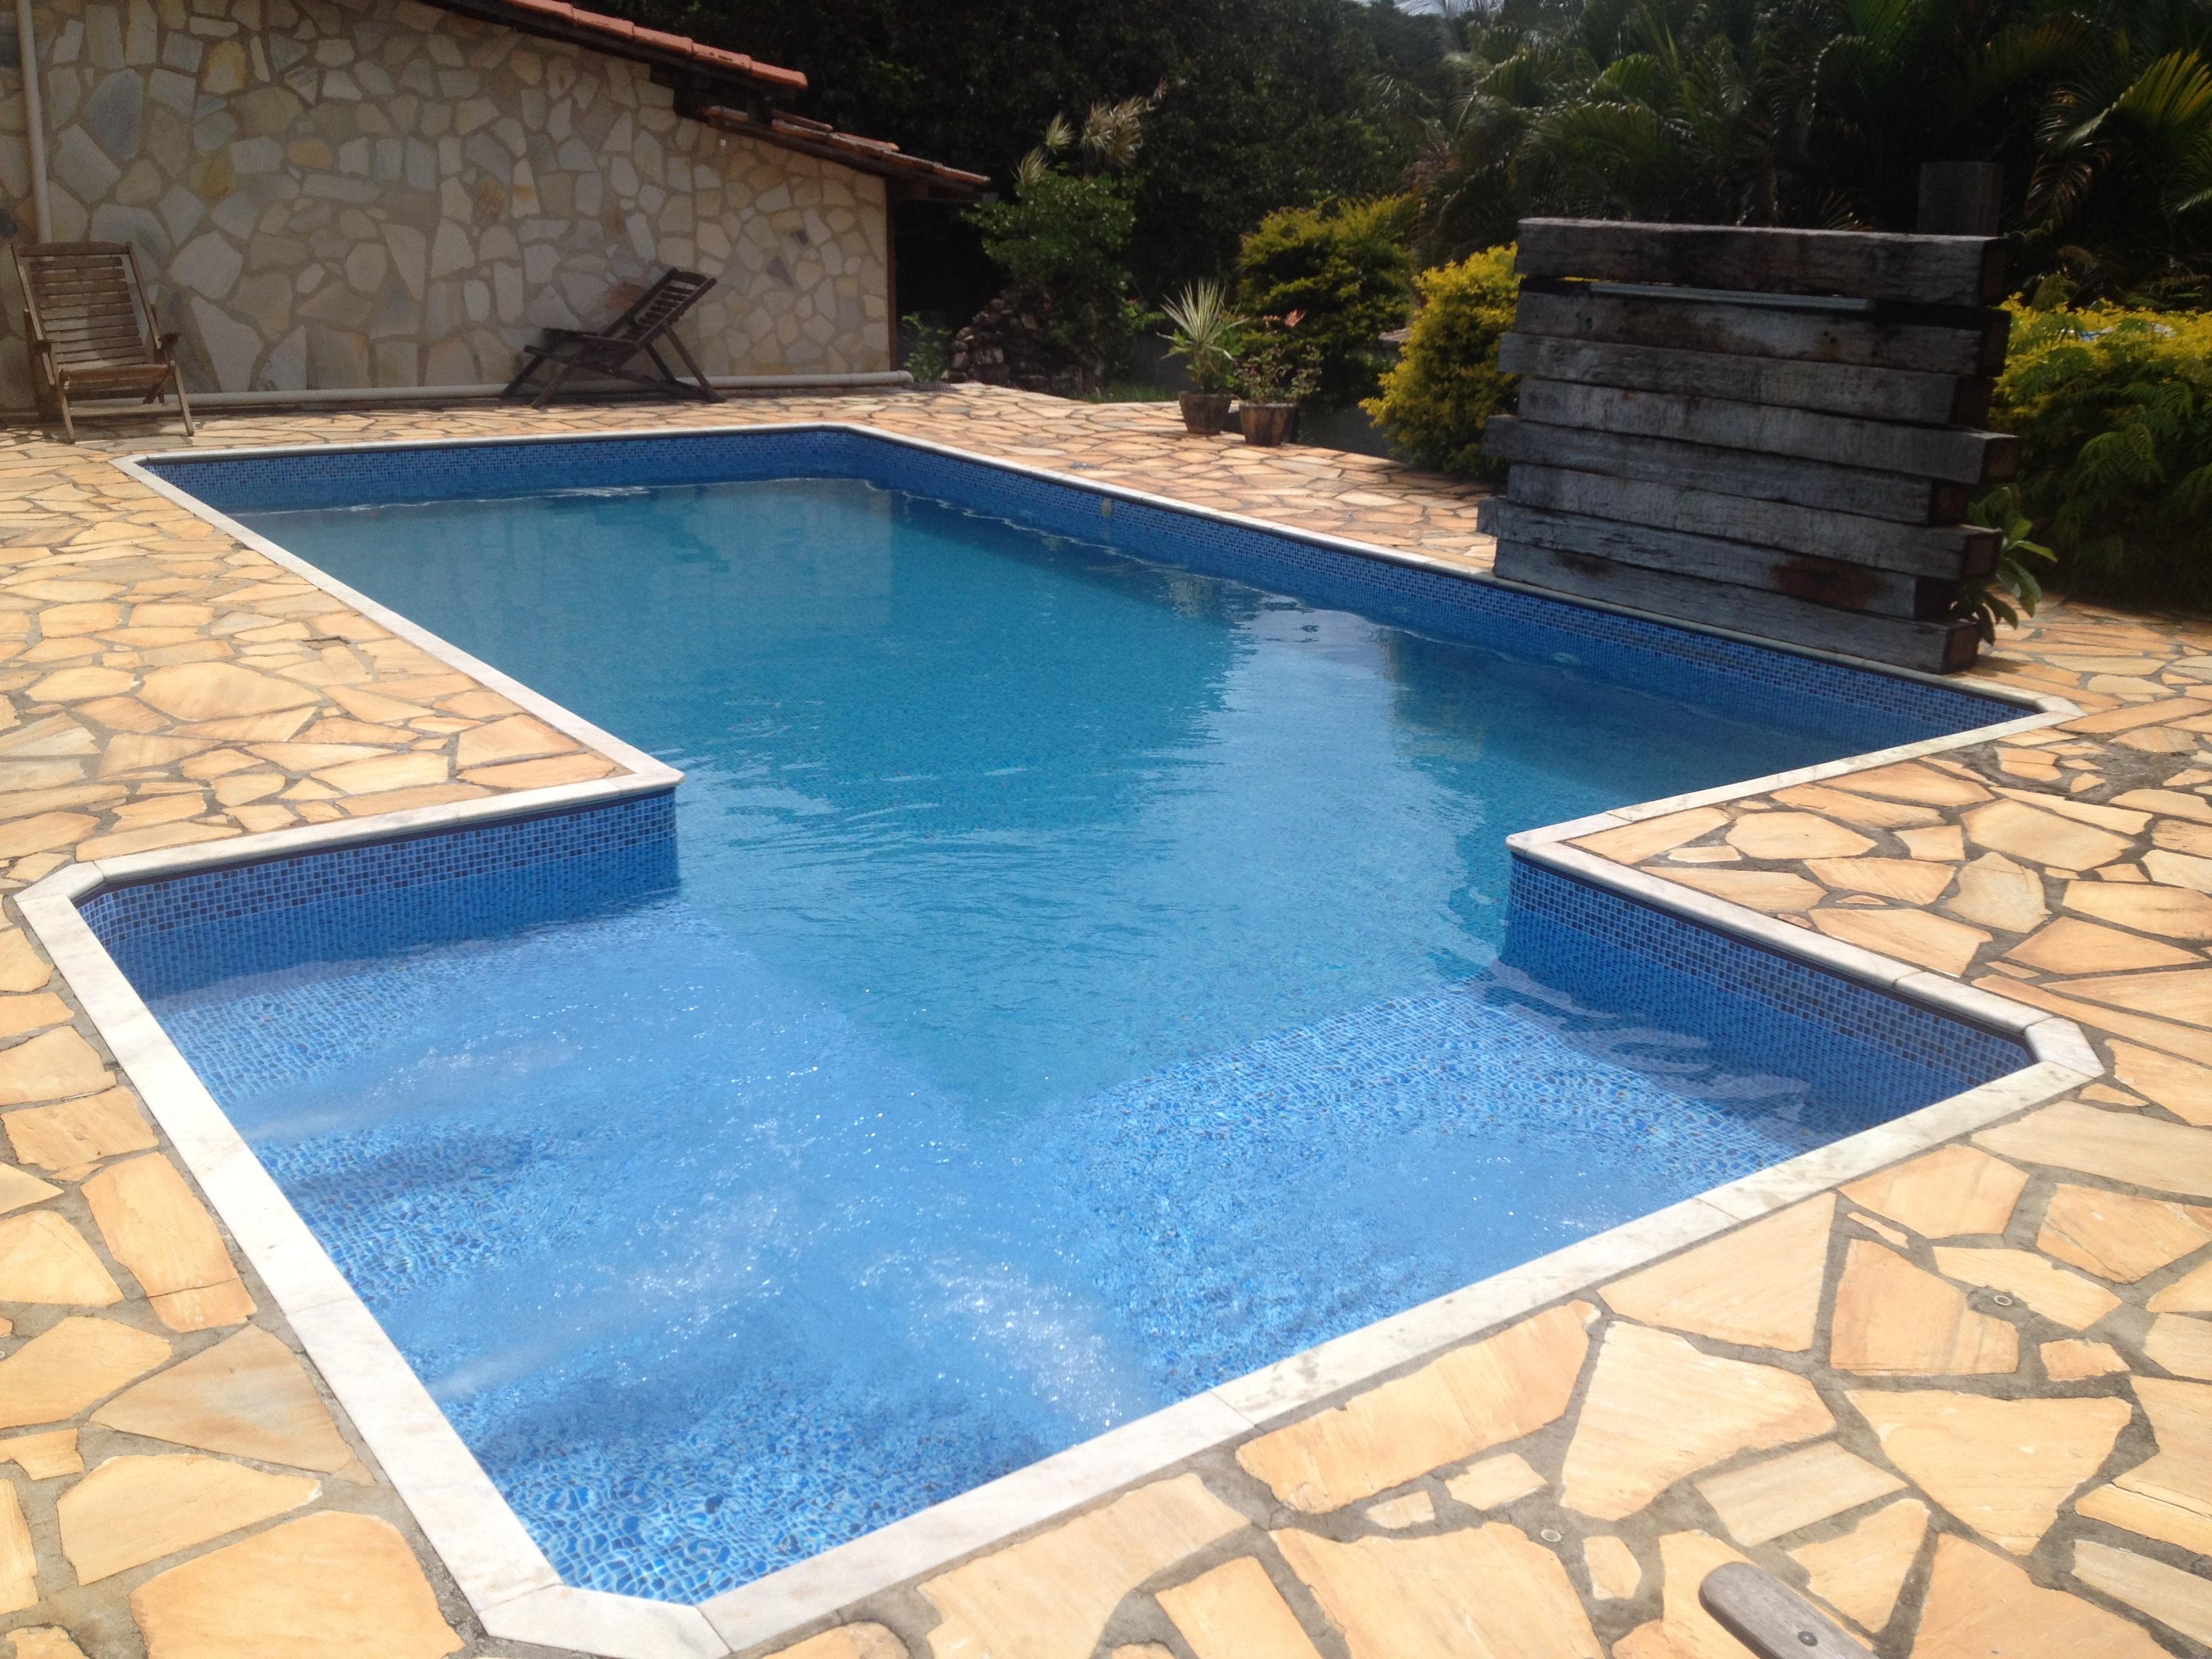 Modelos de piscinas para sua casa 40 fotos - Piscinas para casas ...